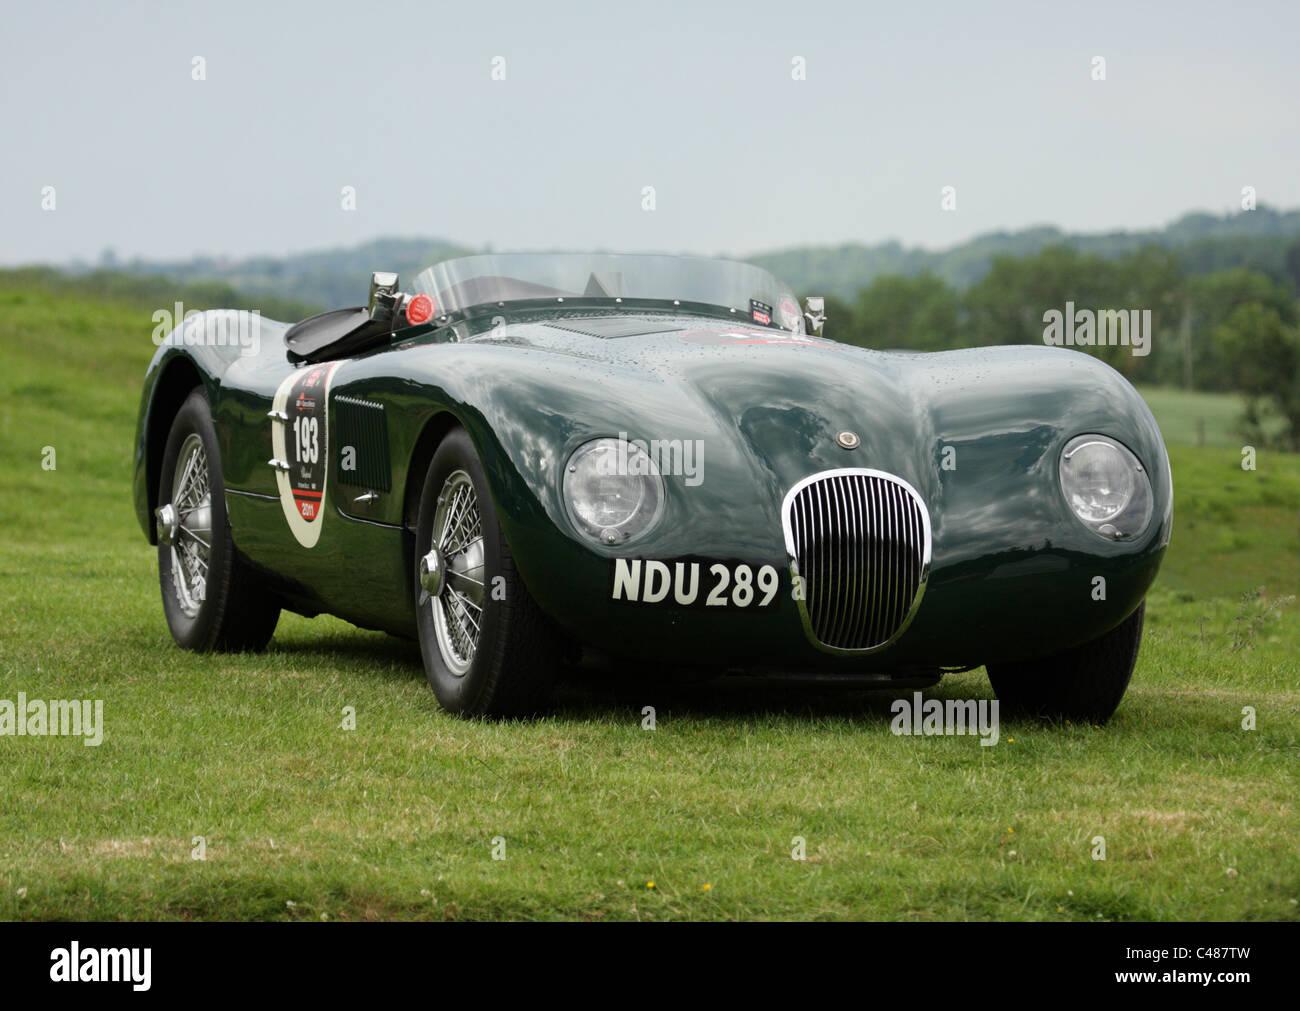 1950s Racing Car Stock Photos Images Alamy Jaguar Cars A Classic C Type At Shelsley Walsh Hill Climb During